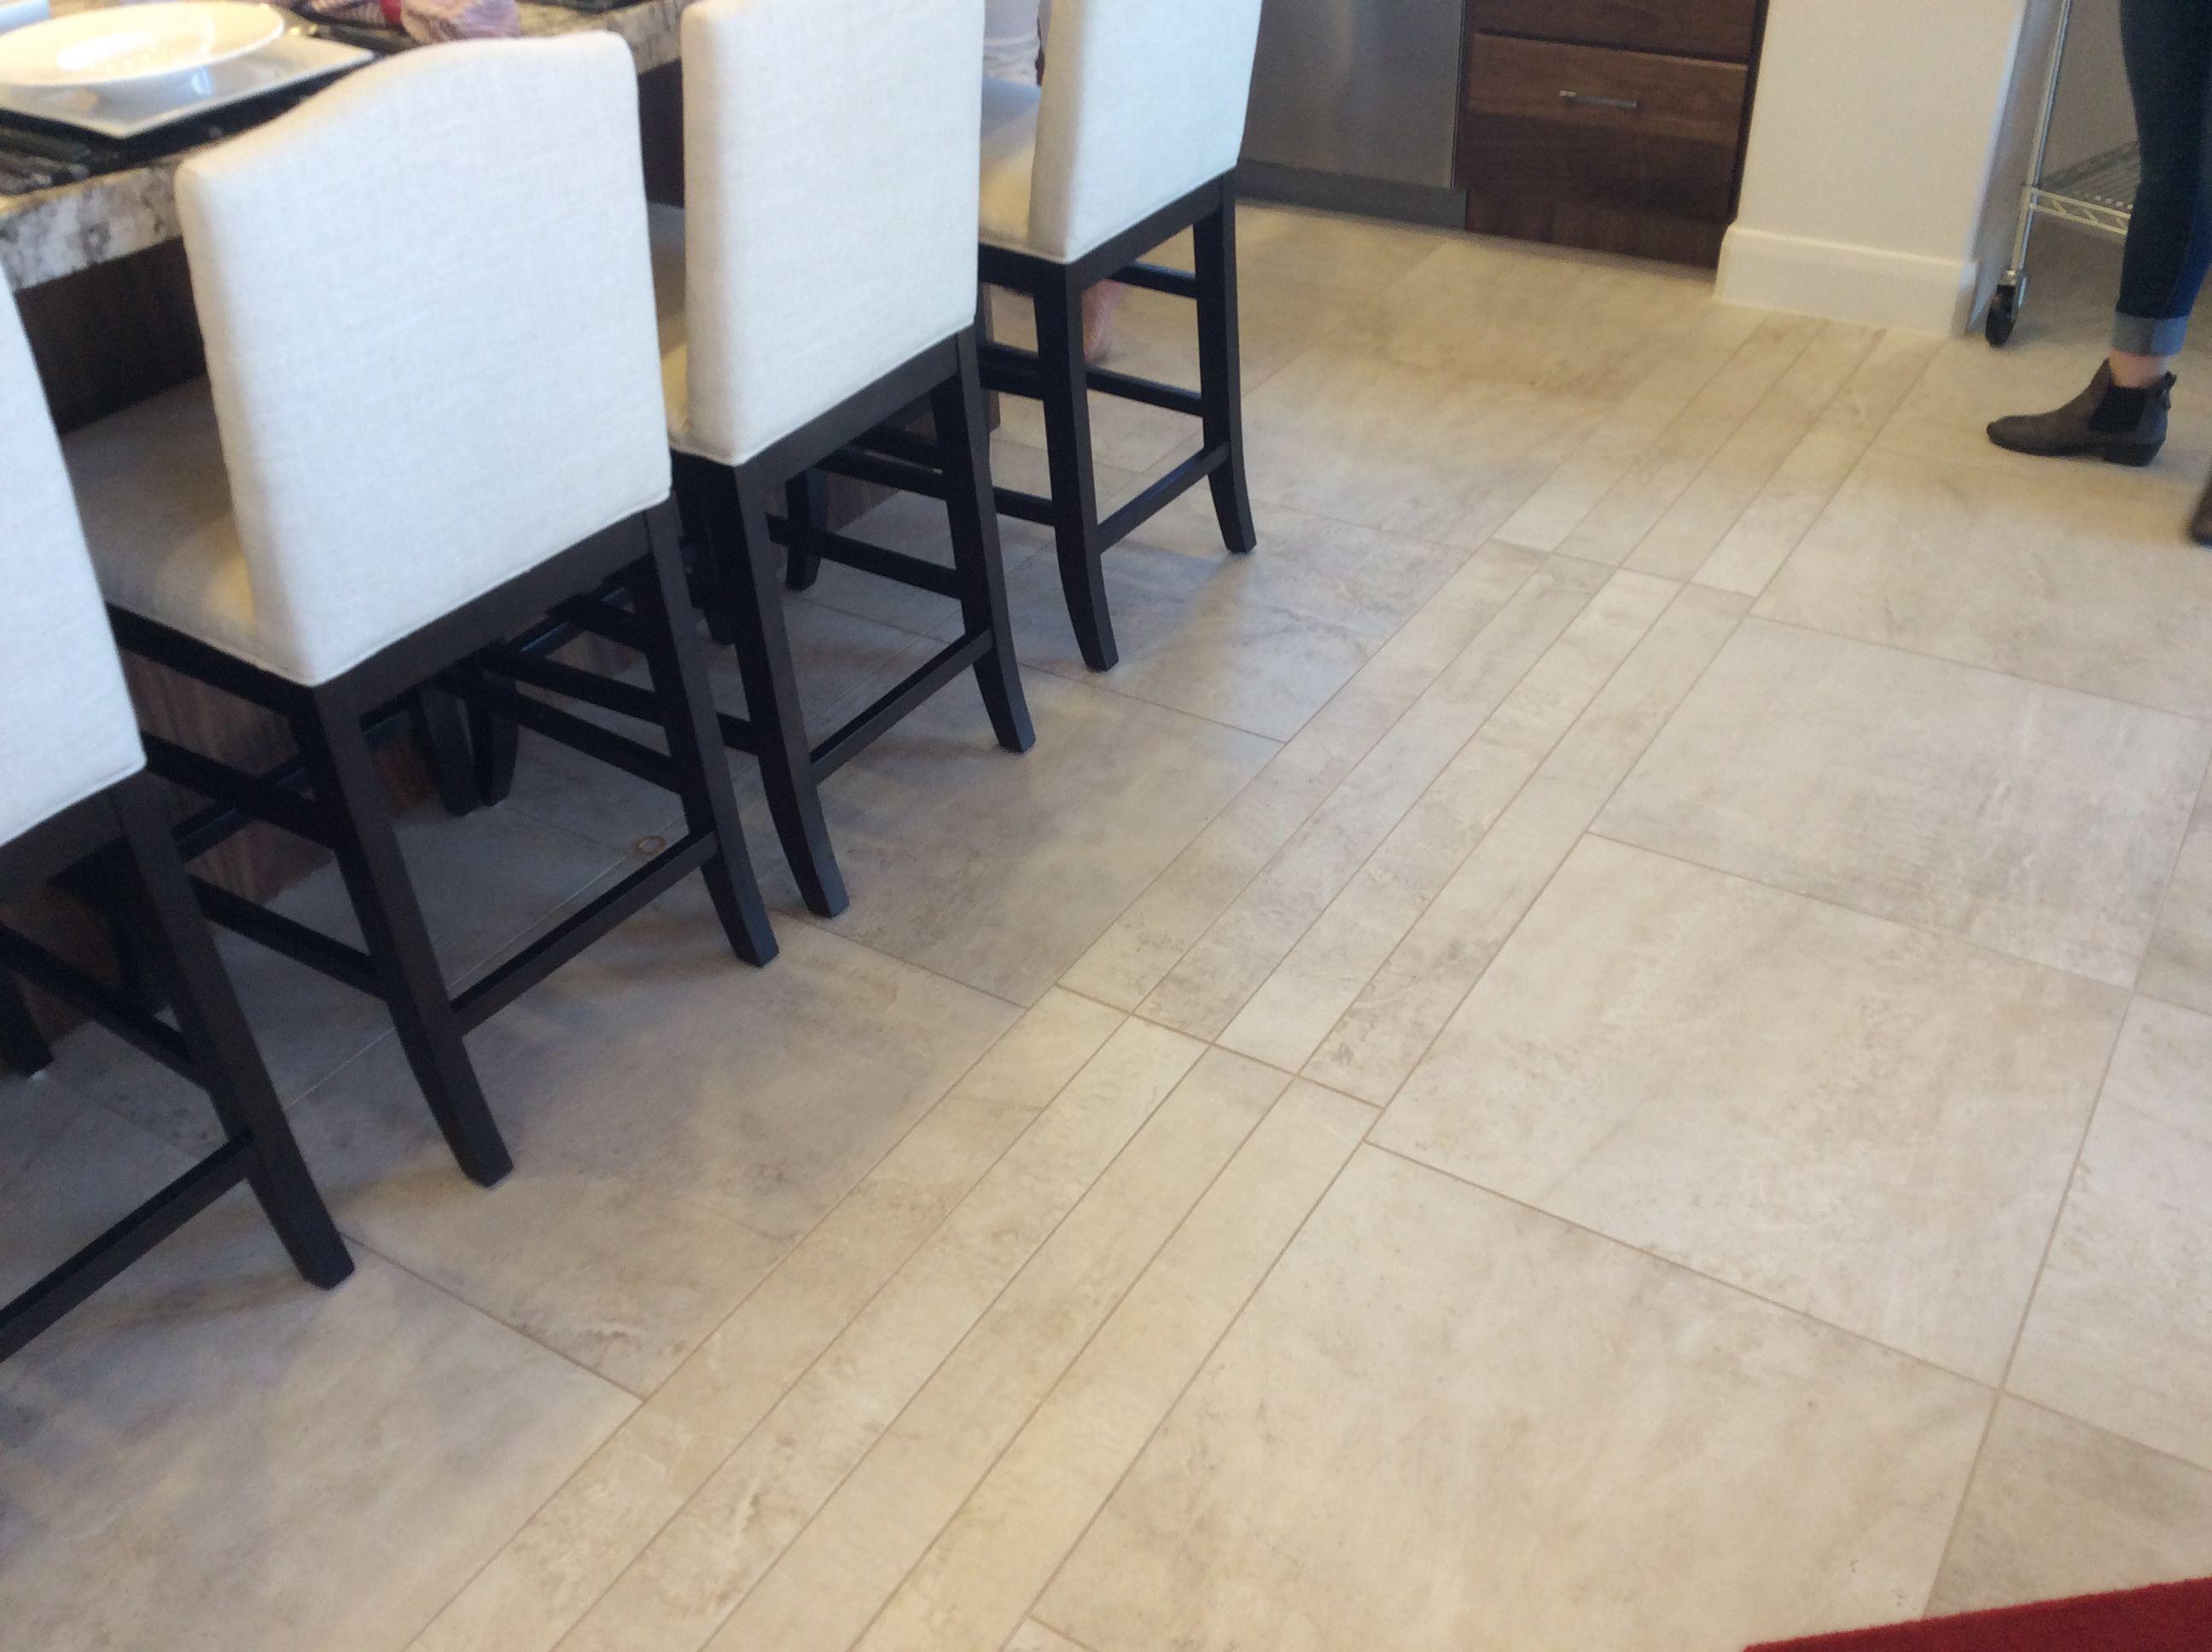 Daltile Imagica Vision Tile House flooring, Daltile